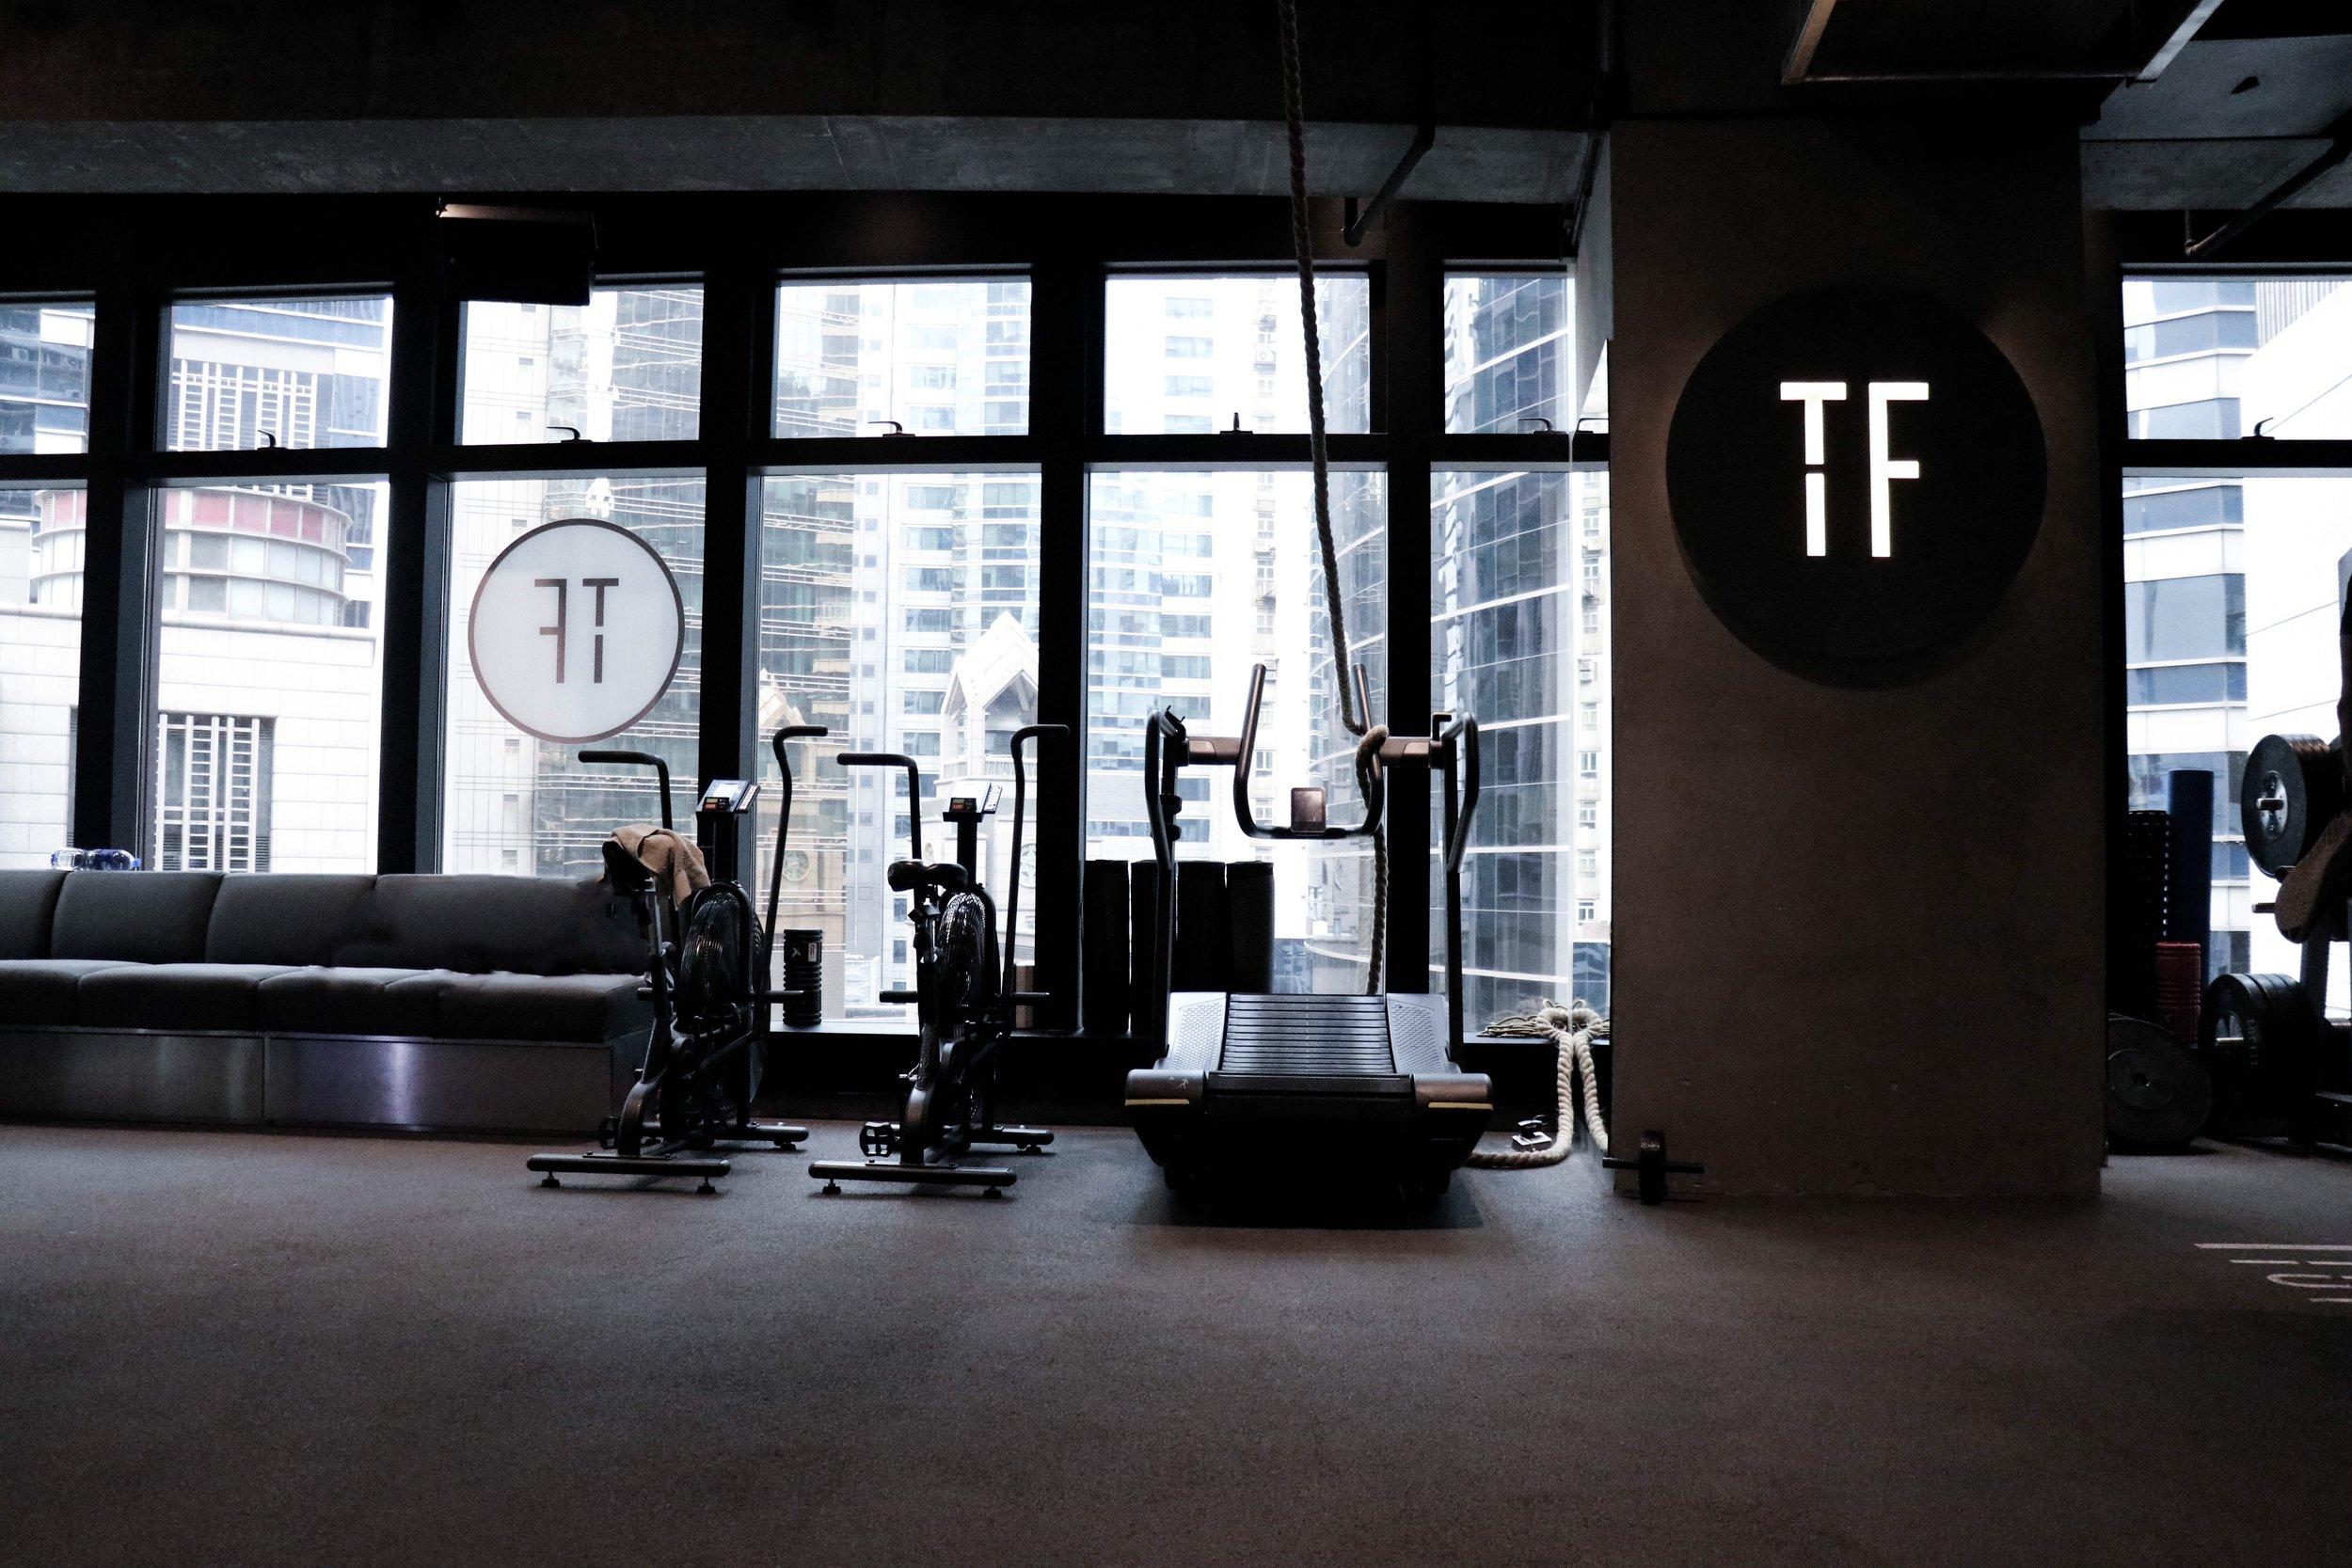 Gym Rental View - TopFit Gym Hong Kong.JPG